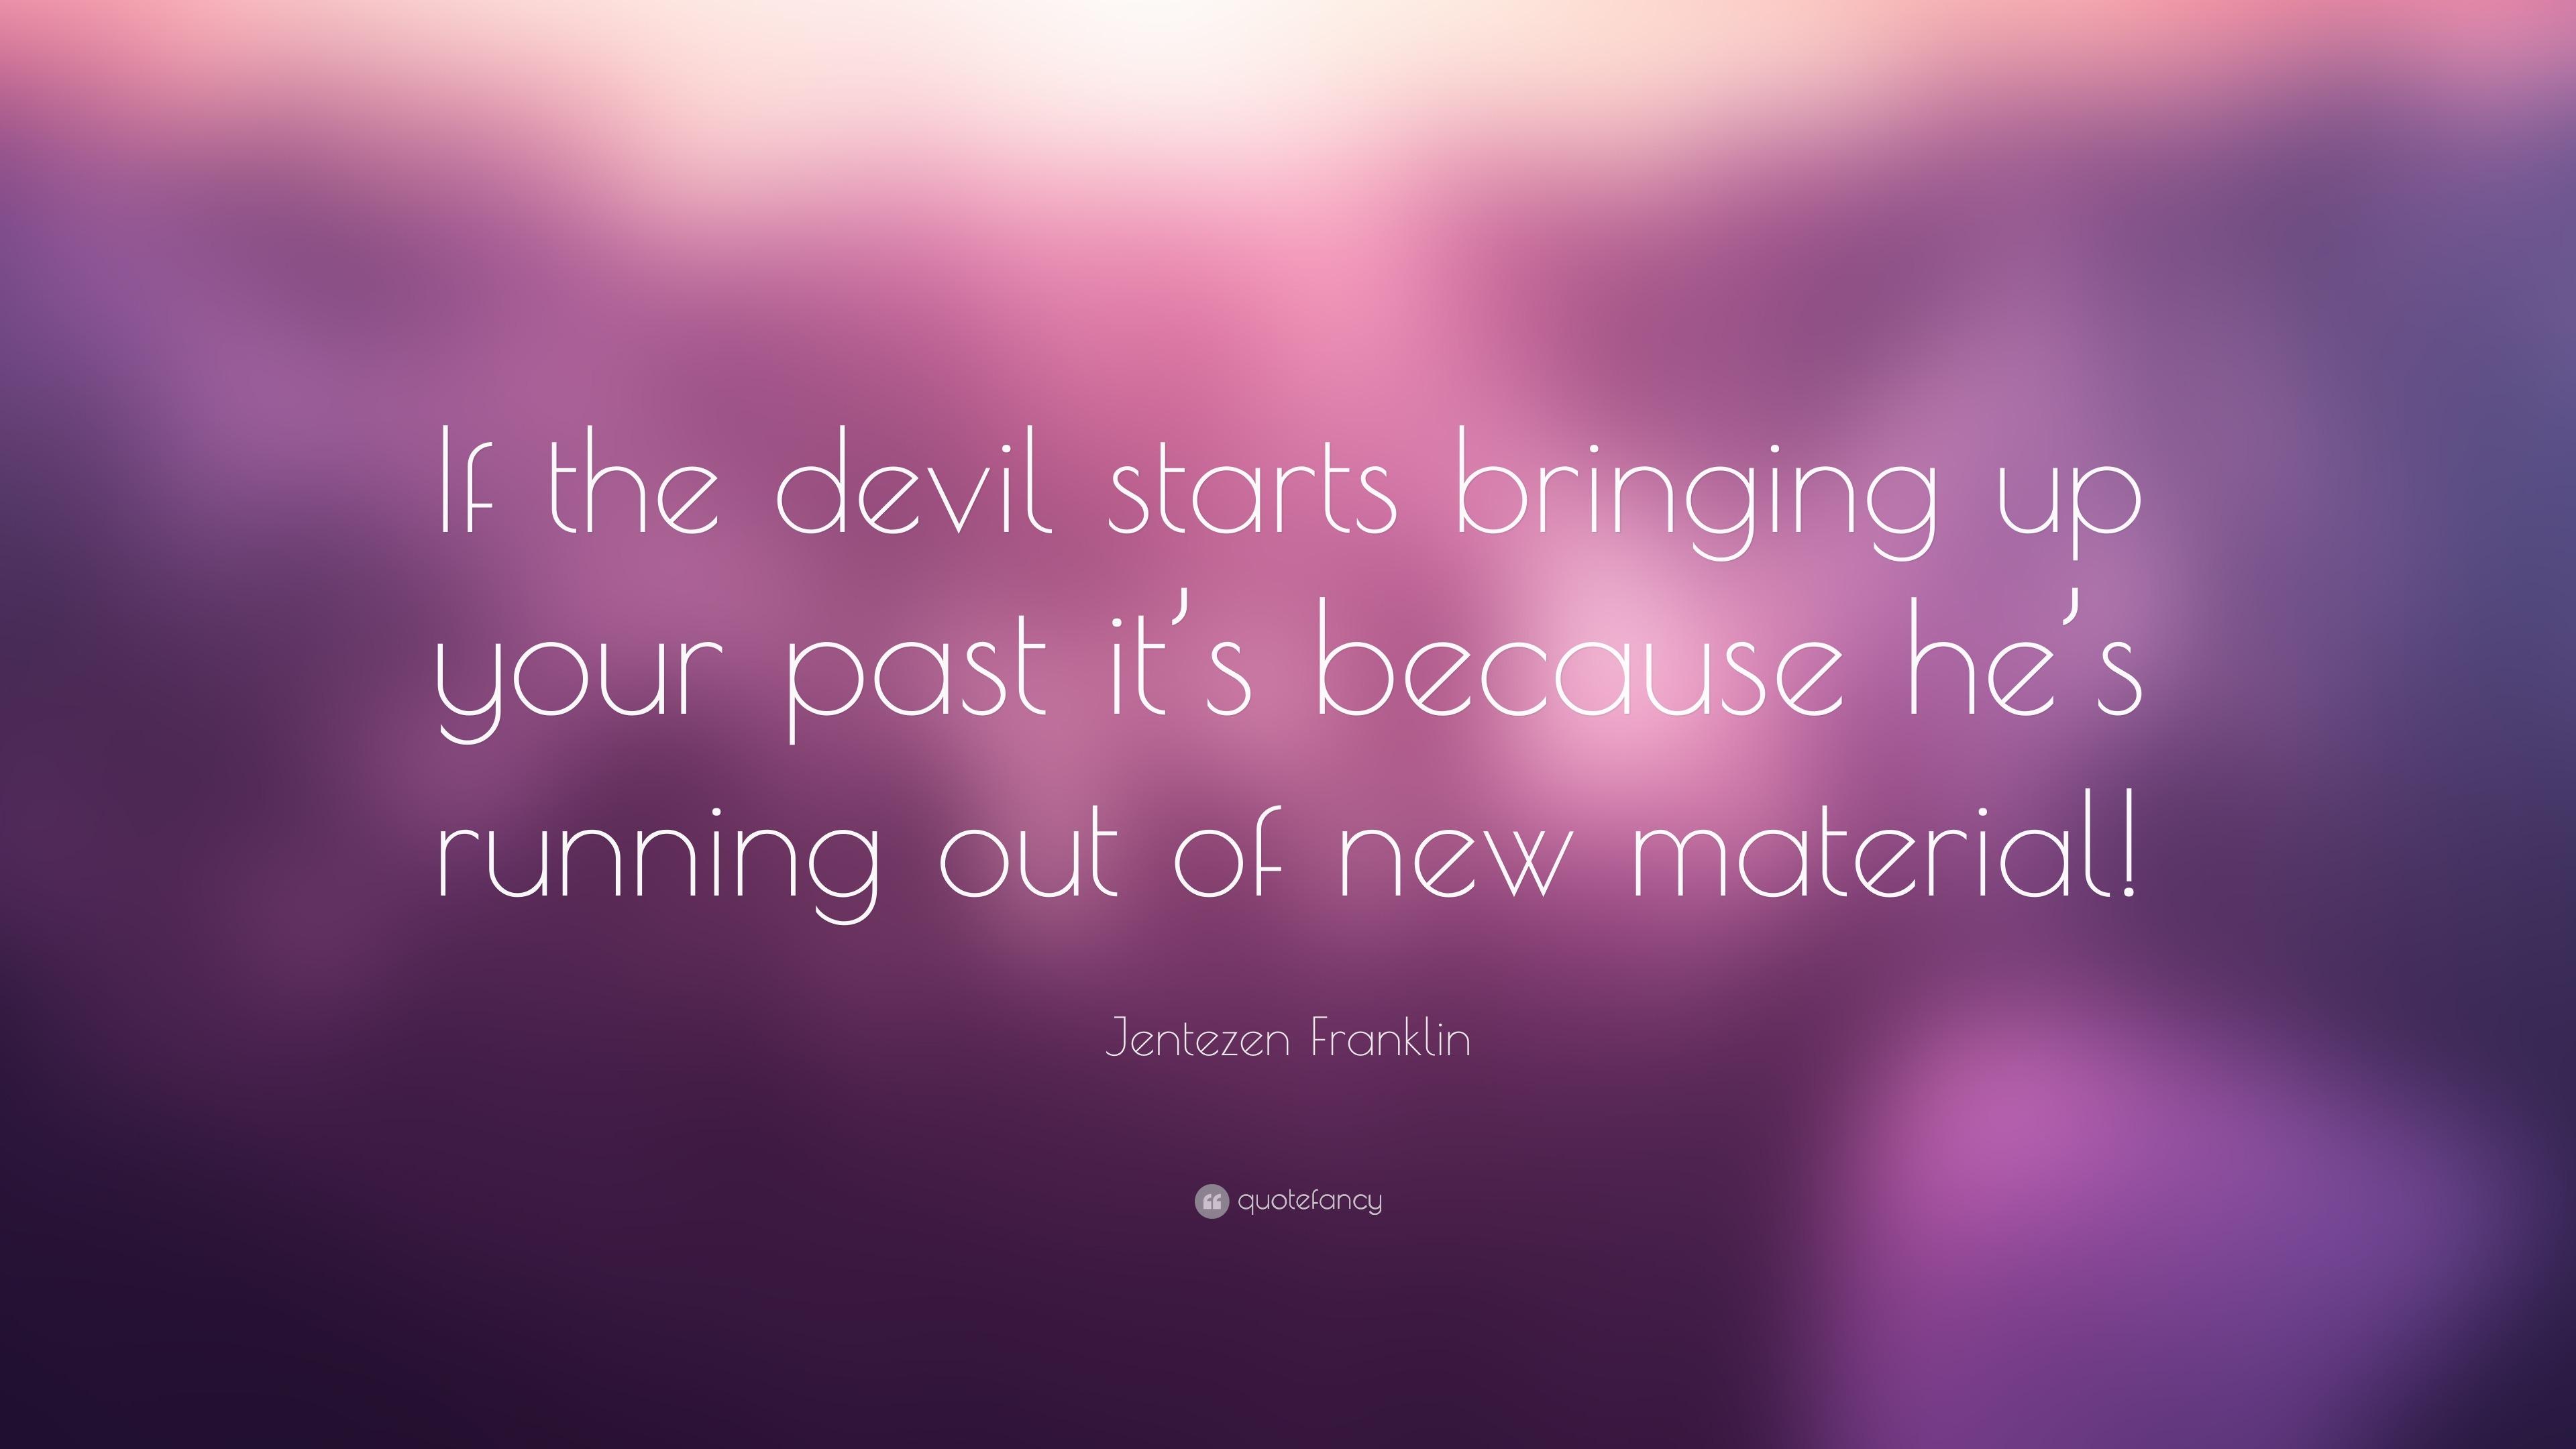 Bringing Up The Past Quotes: Jentezen Franklin Quotes (45 Wallpapers)